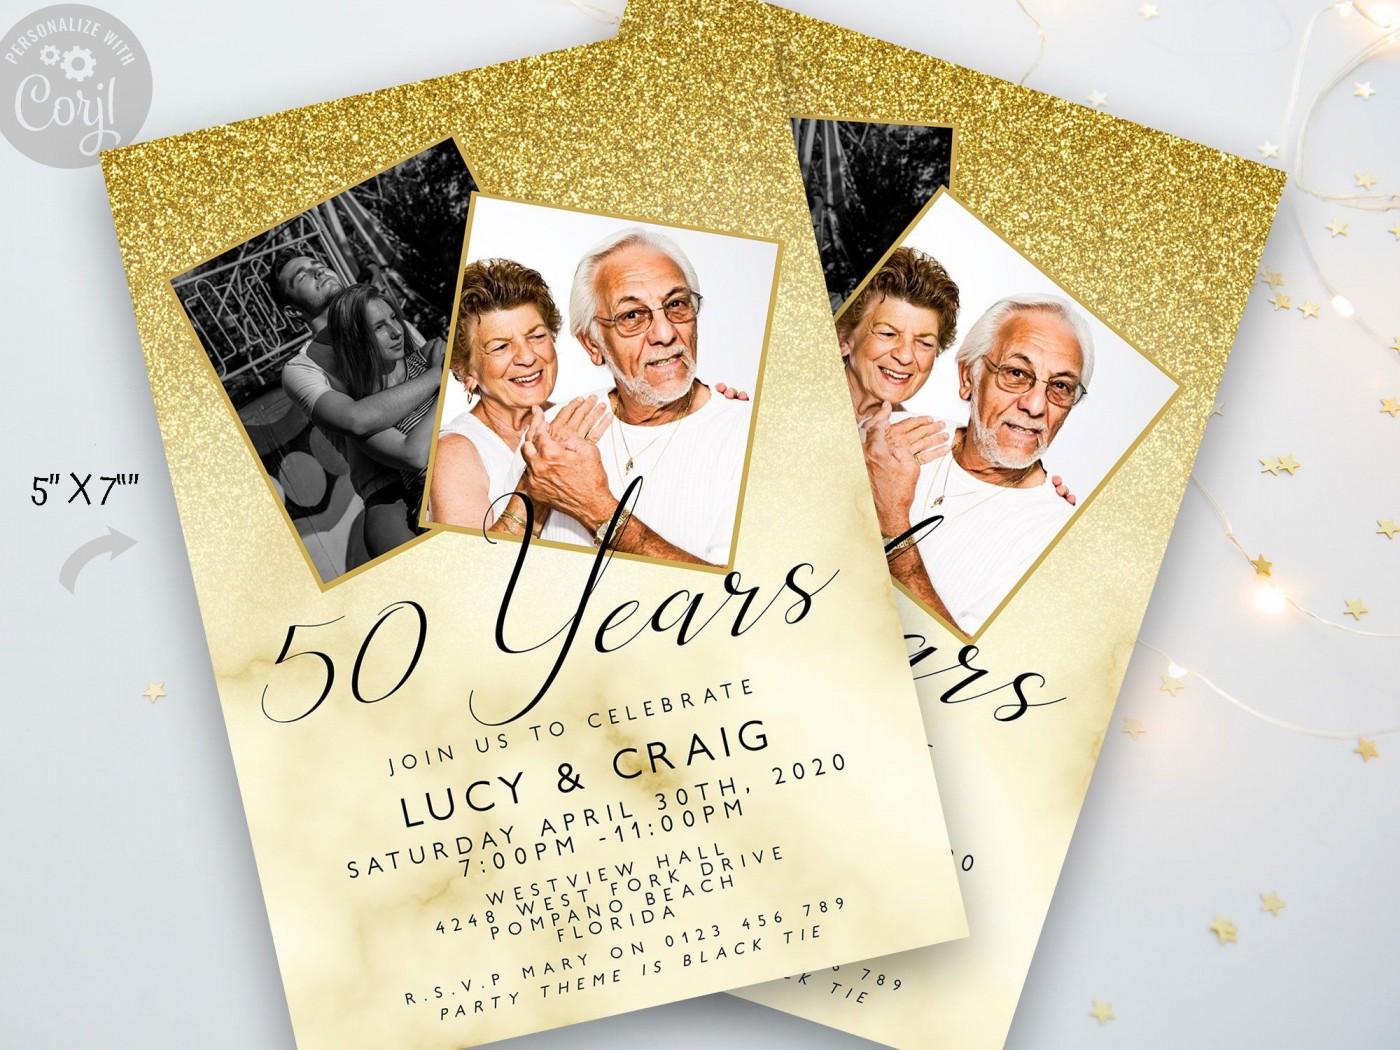 006 Rare 50th Anniversary Party Invitation Template Sample  Wedding Free Download Microsoft Word1400